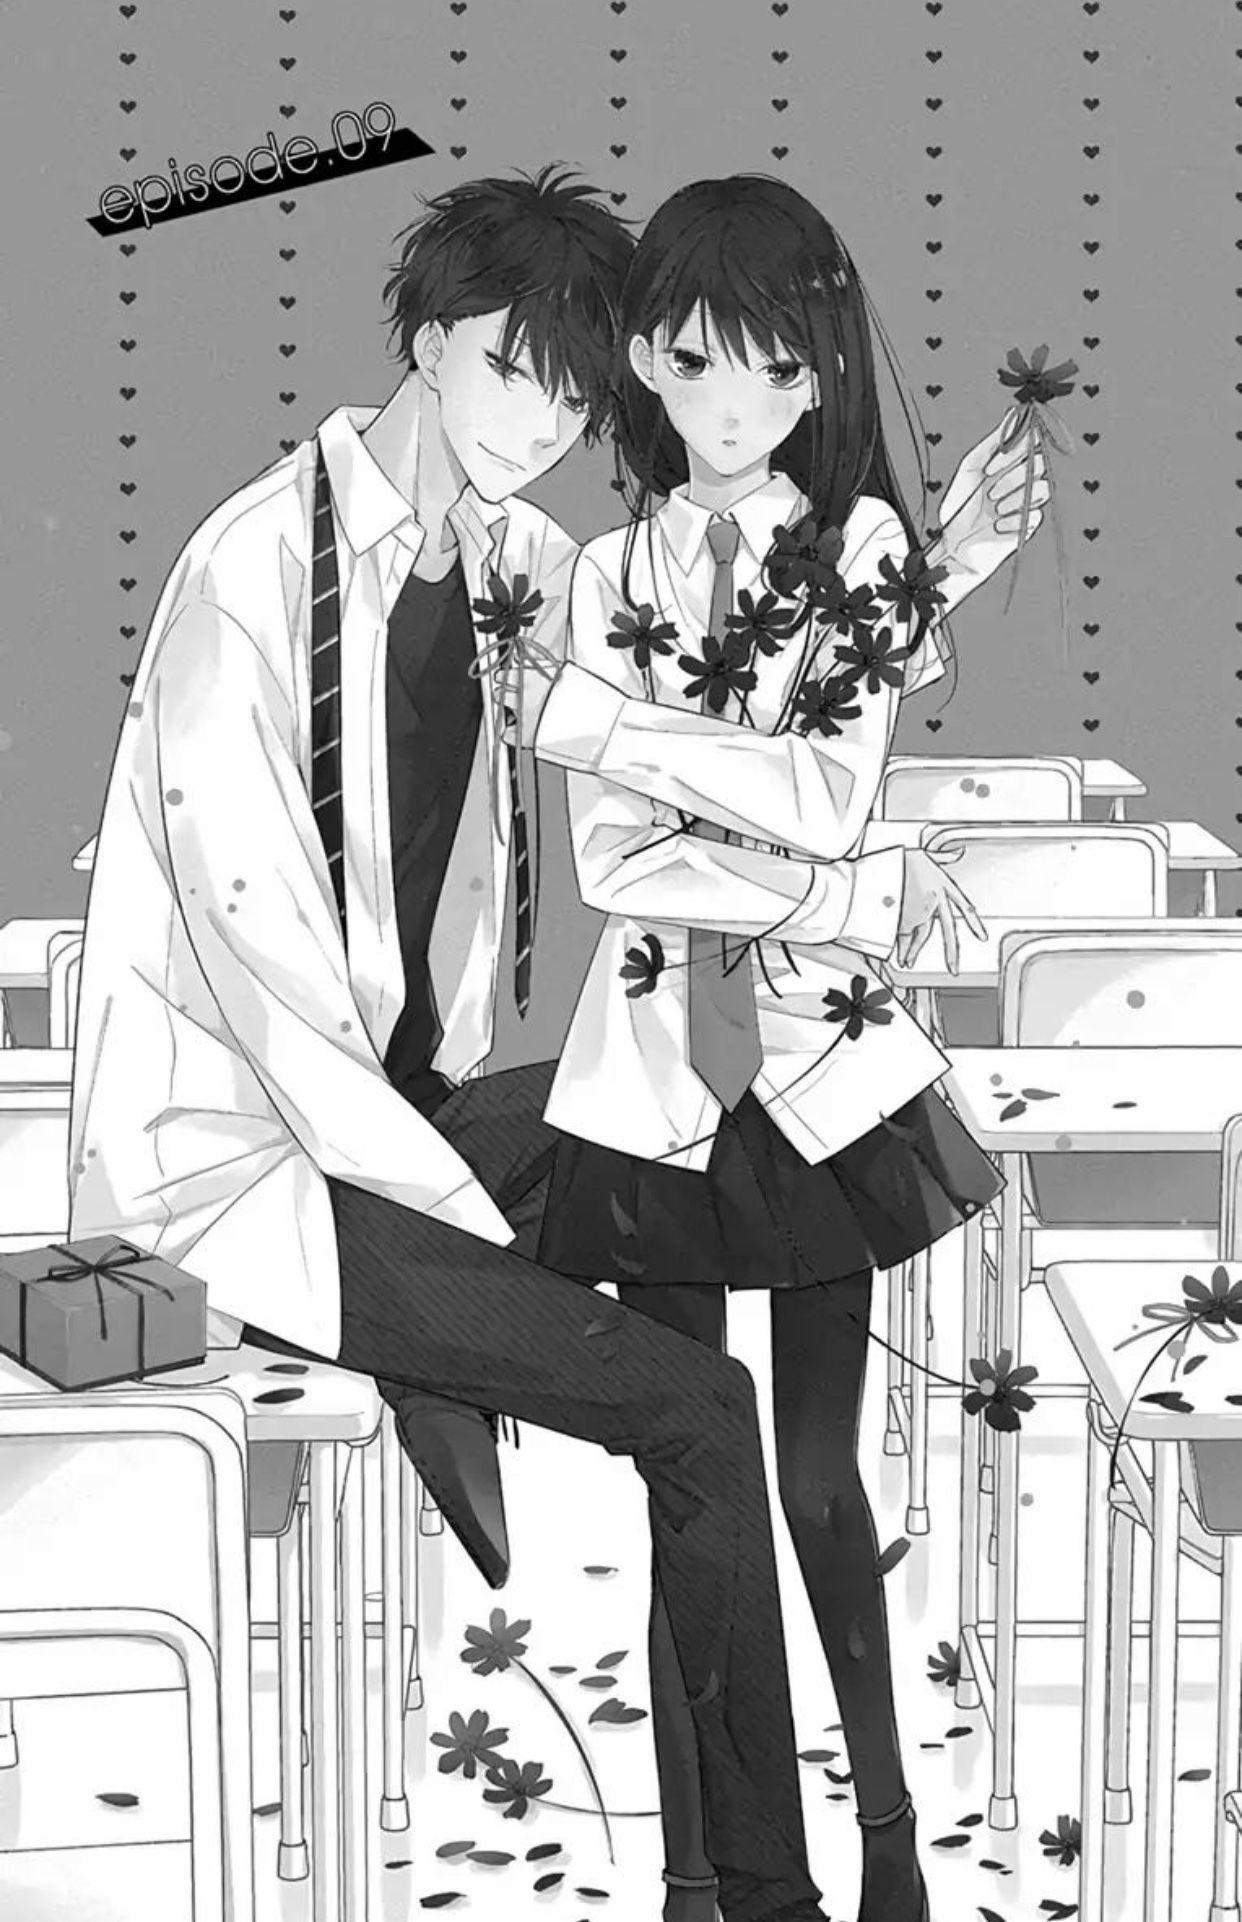 Tsuiraku JK to Haijin Kyoushi Manga image by